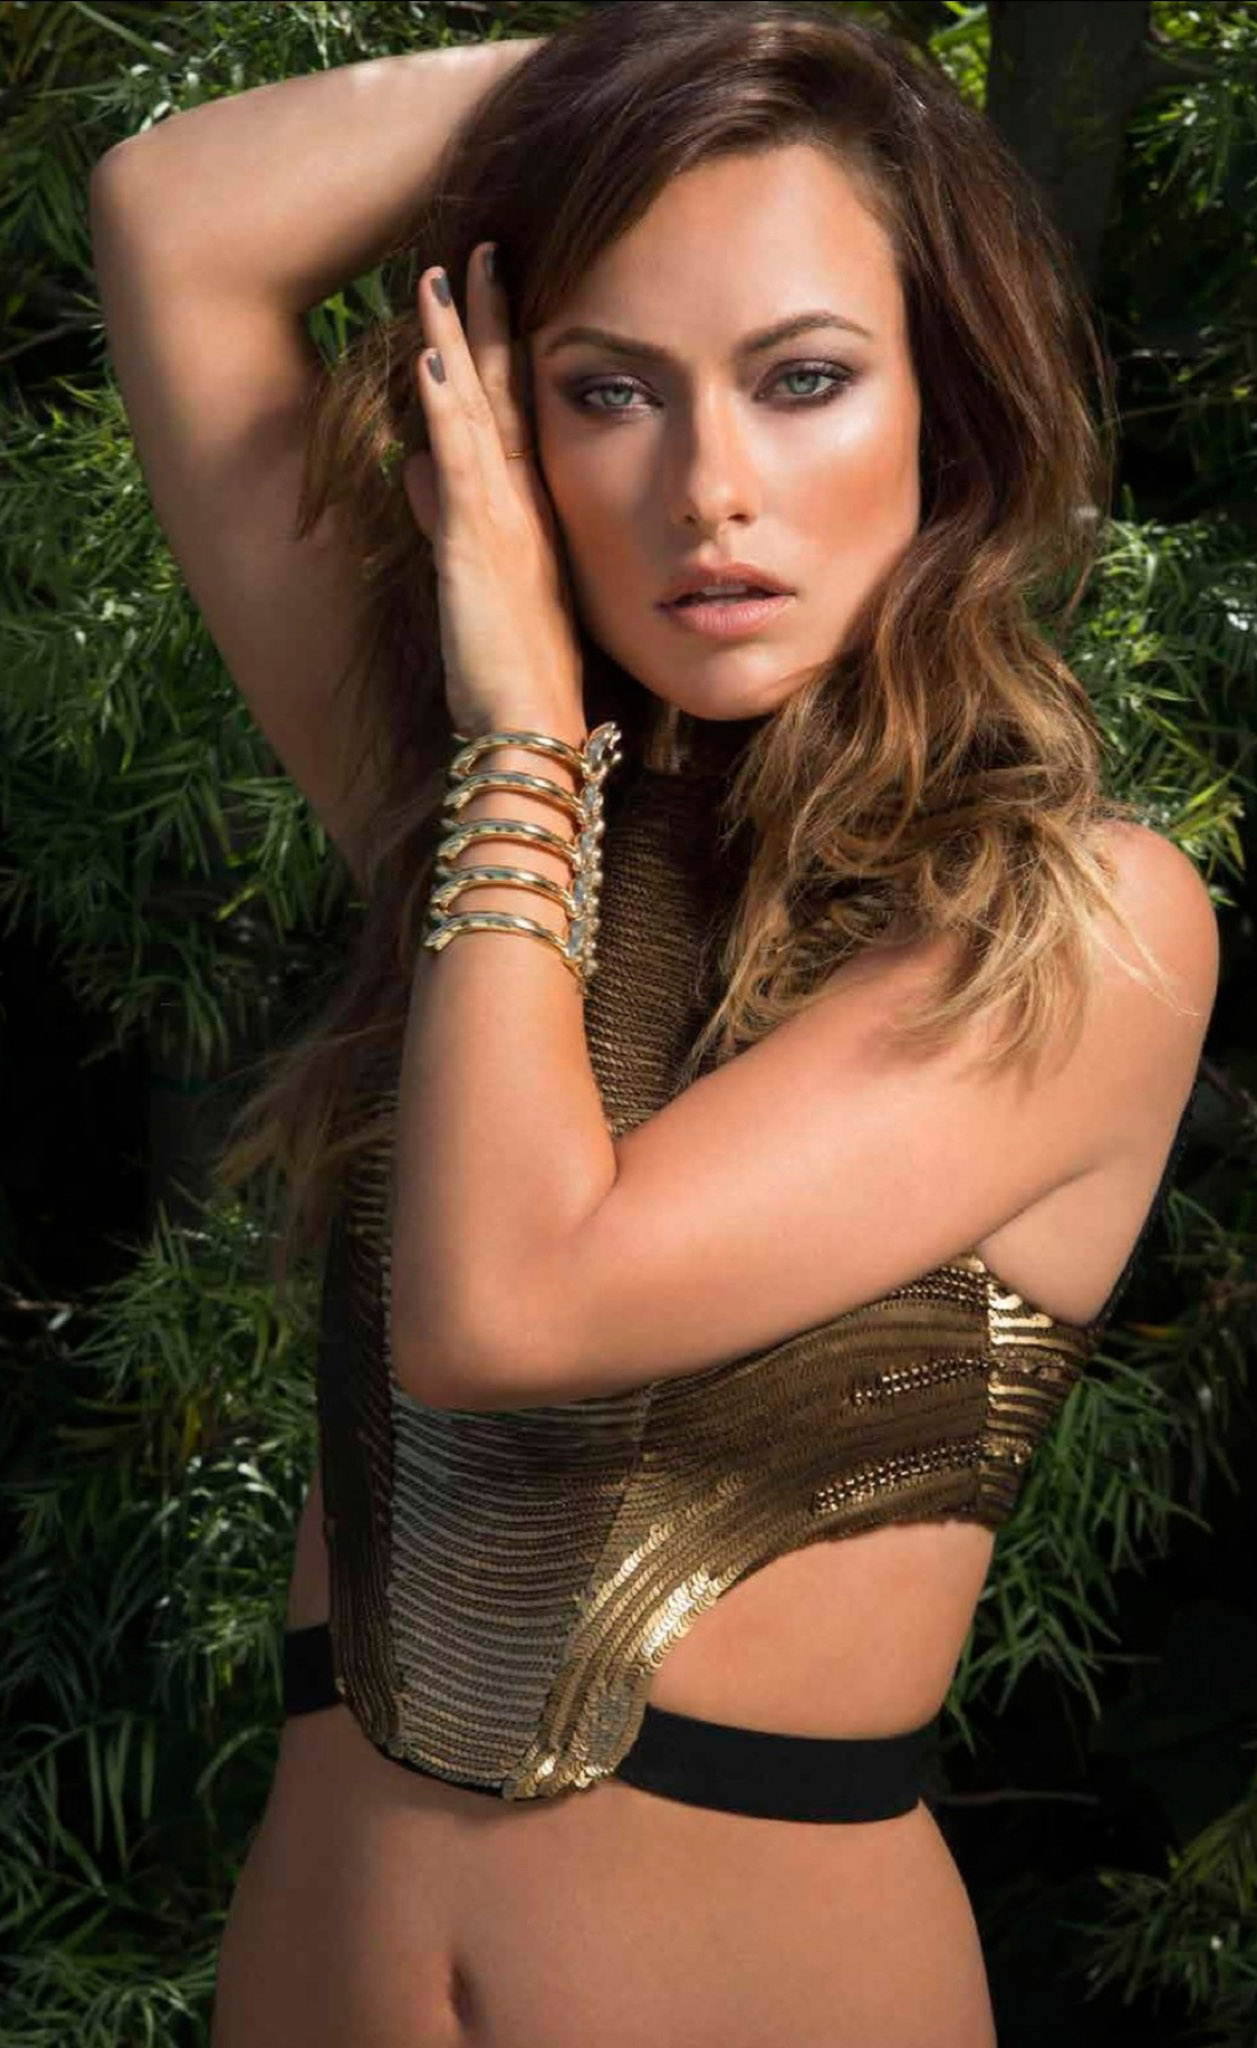 Olivia-Wilde-Hot-Photo US Actress Olivia Wilde Wiki Bio Age Top Weight Scorching Bikini Photographs